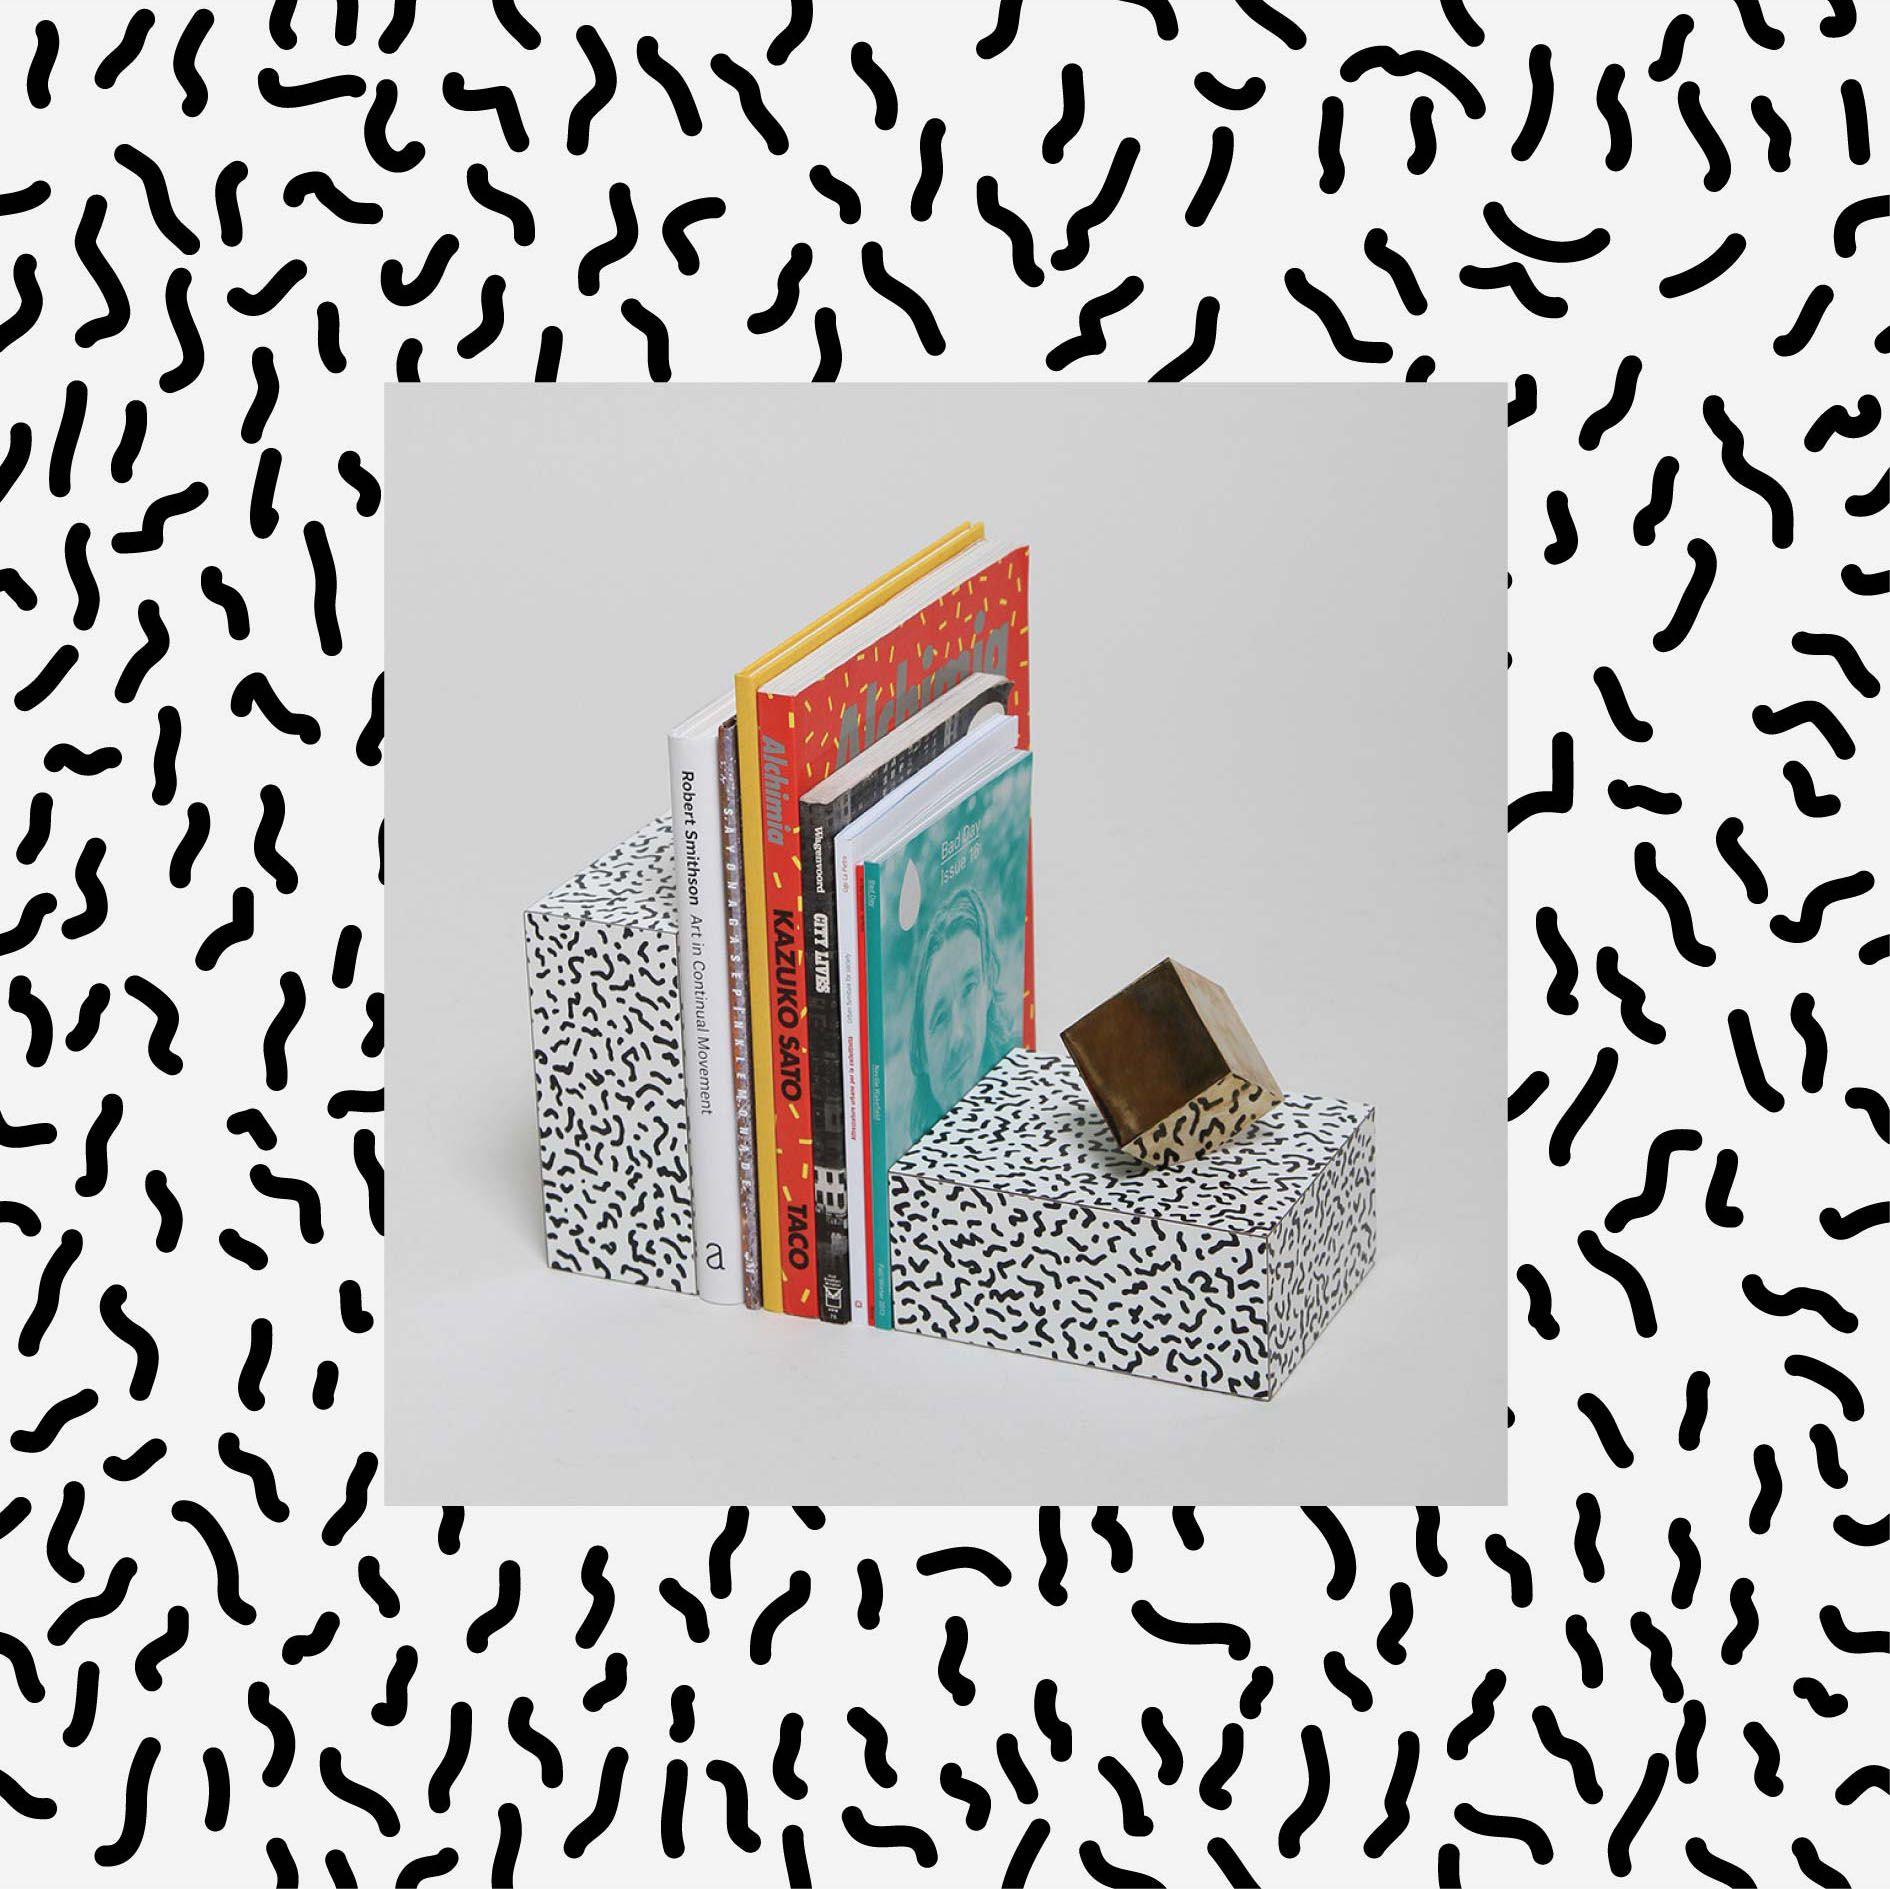 Book color illustrator - Bacteria Book Ends Design Vector Graphic Illustrator Pattern Fabric